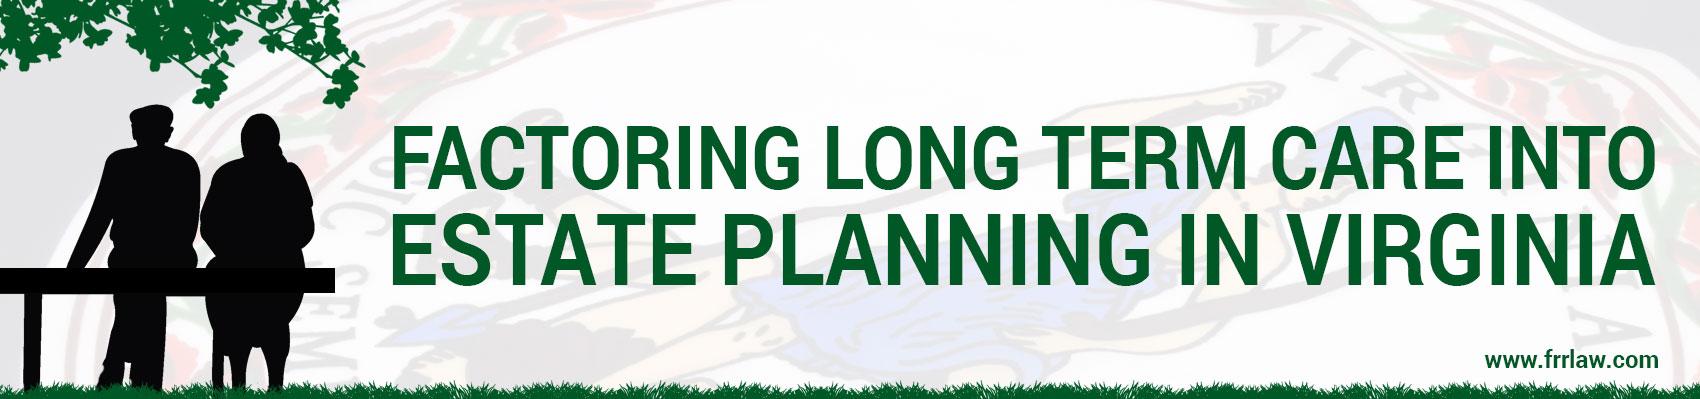 factoring_long_term_care_blog_hdr